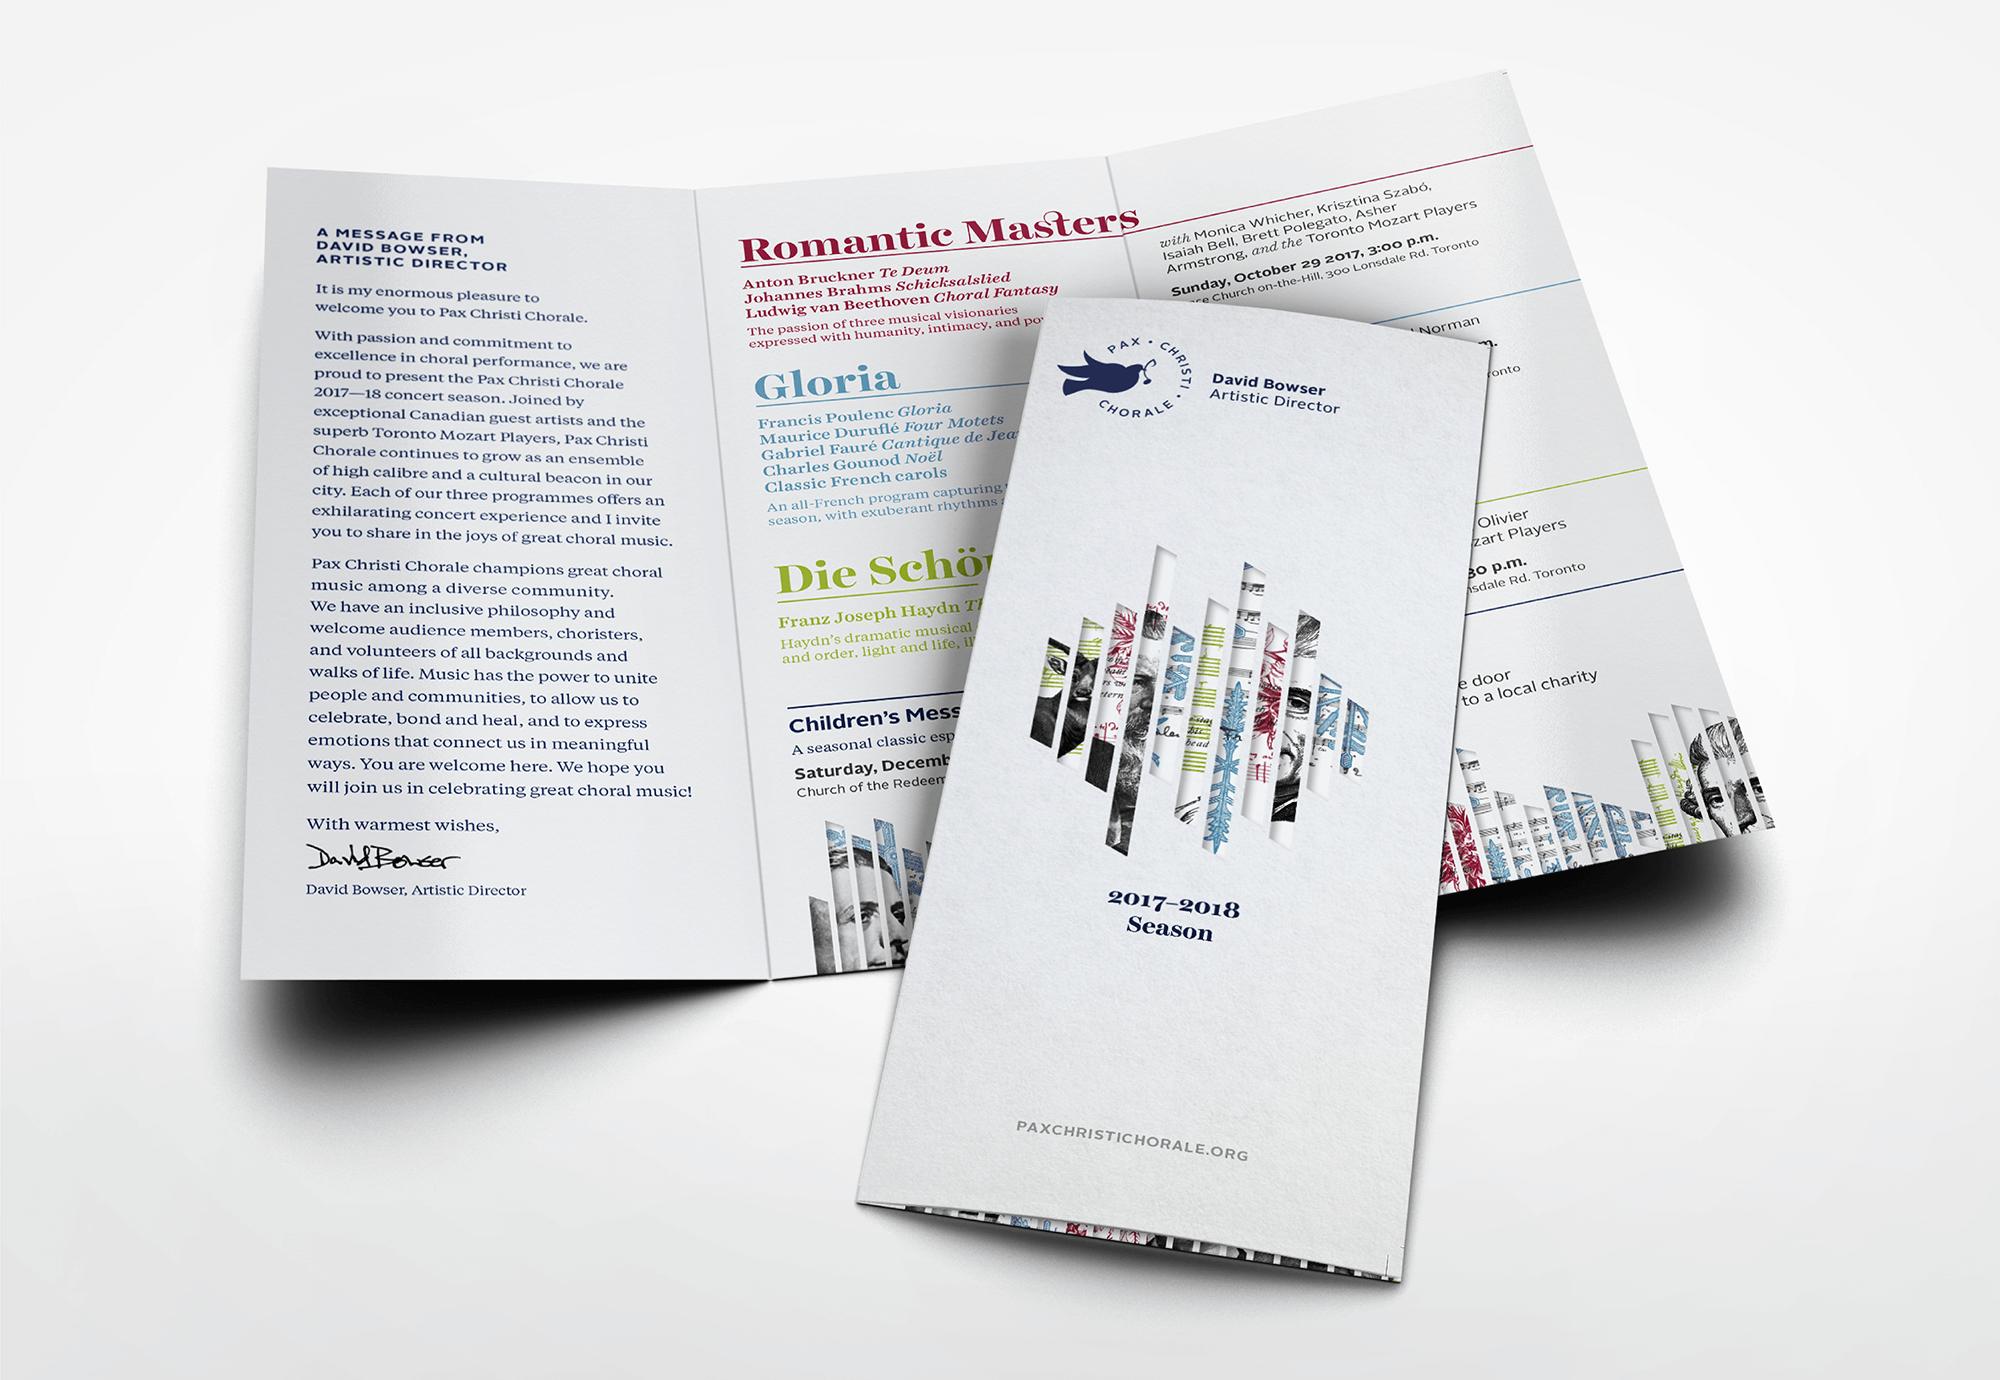 KatePeer_Designer_Strategist_London_England_Toronto_Branding_Editorial_Positioning_PCC-35.png